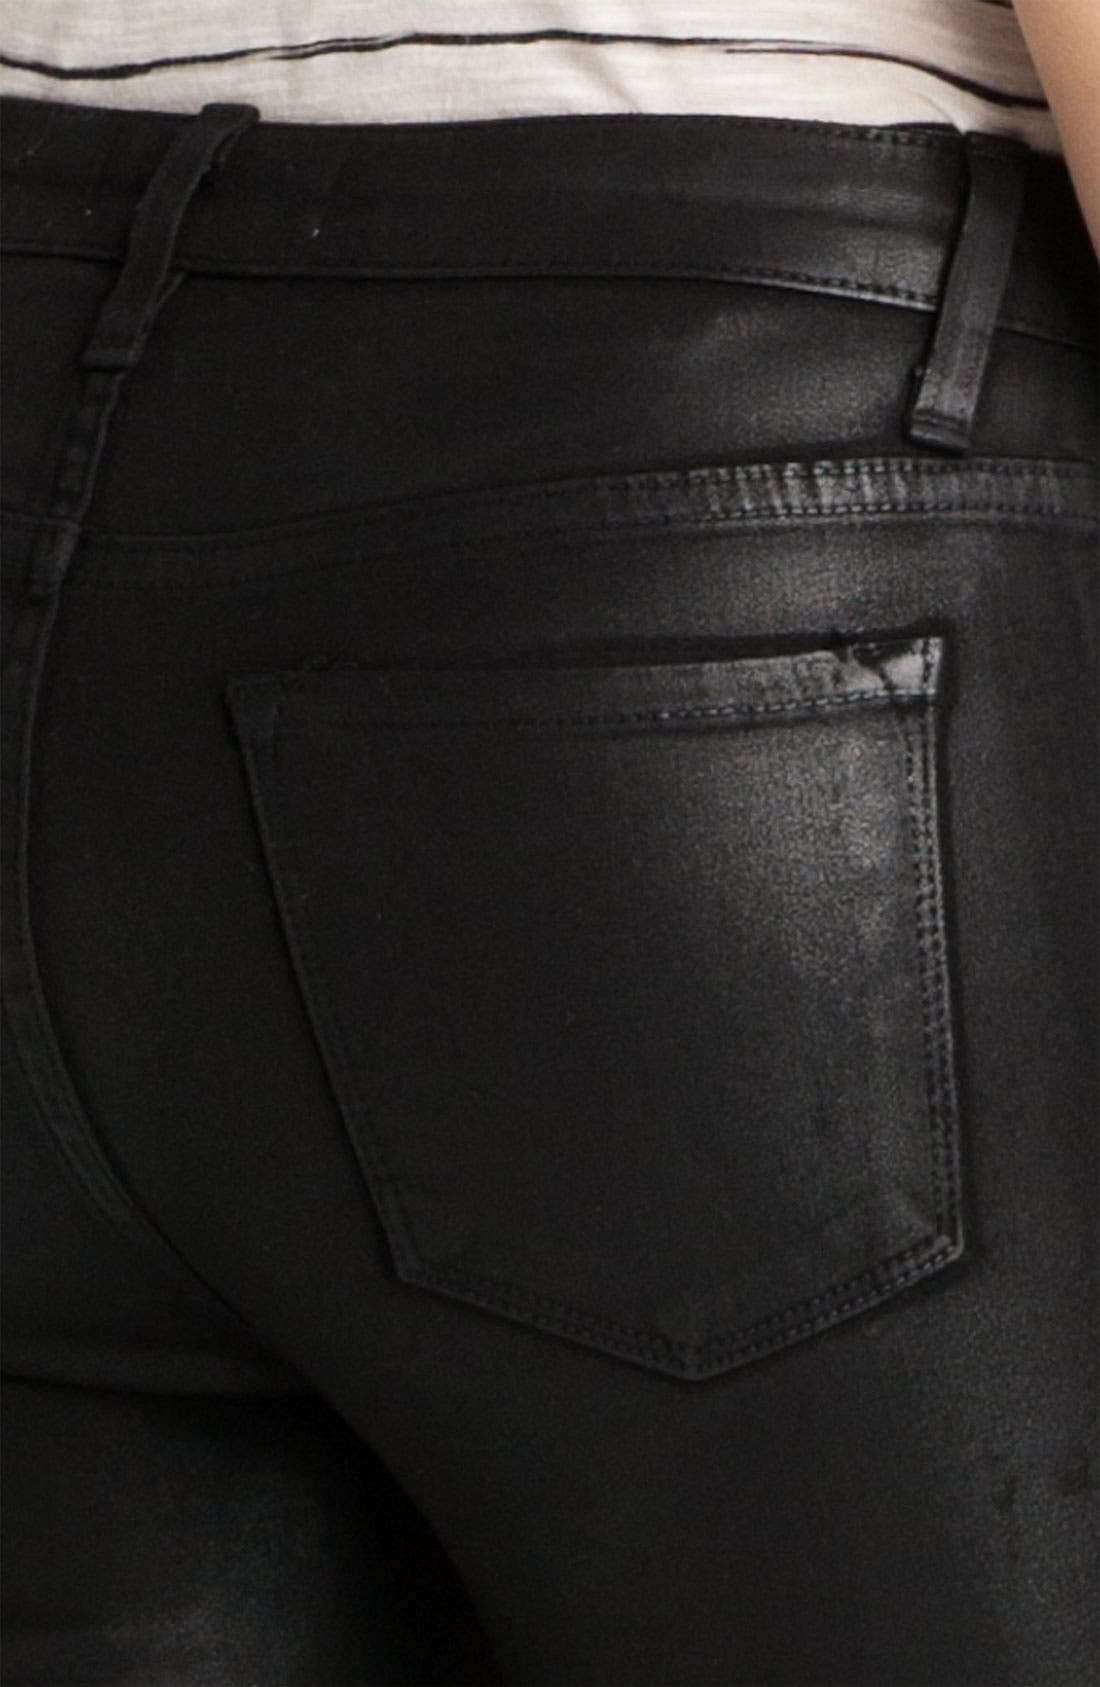 Sarah & George Coated Denim Jeans,                             Alternate thumbnail 2, color,                             001